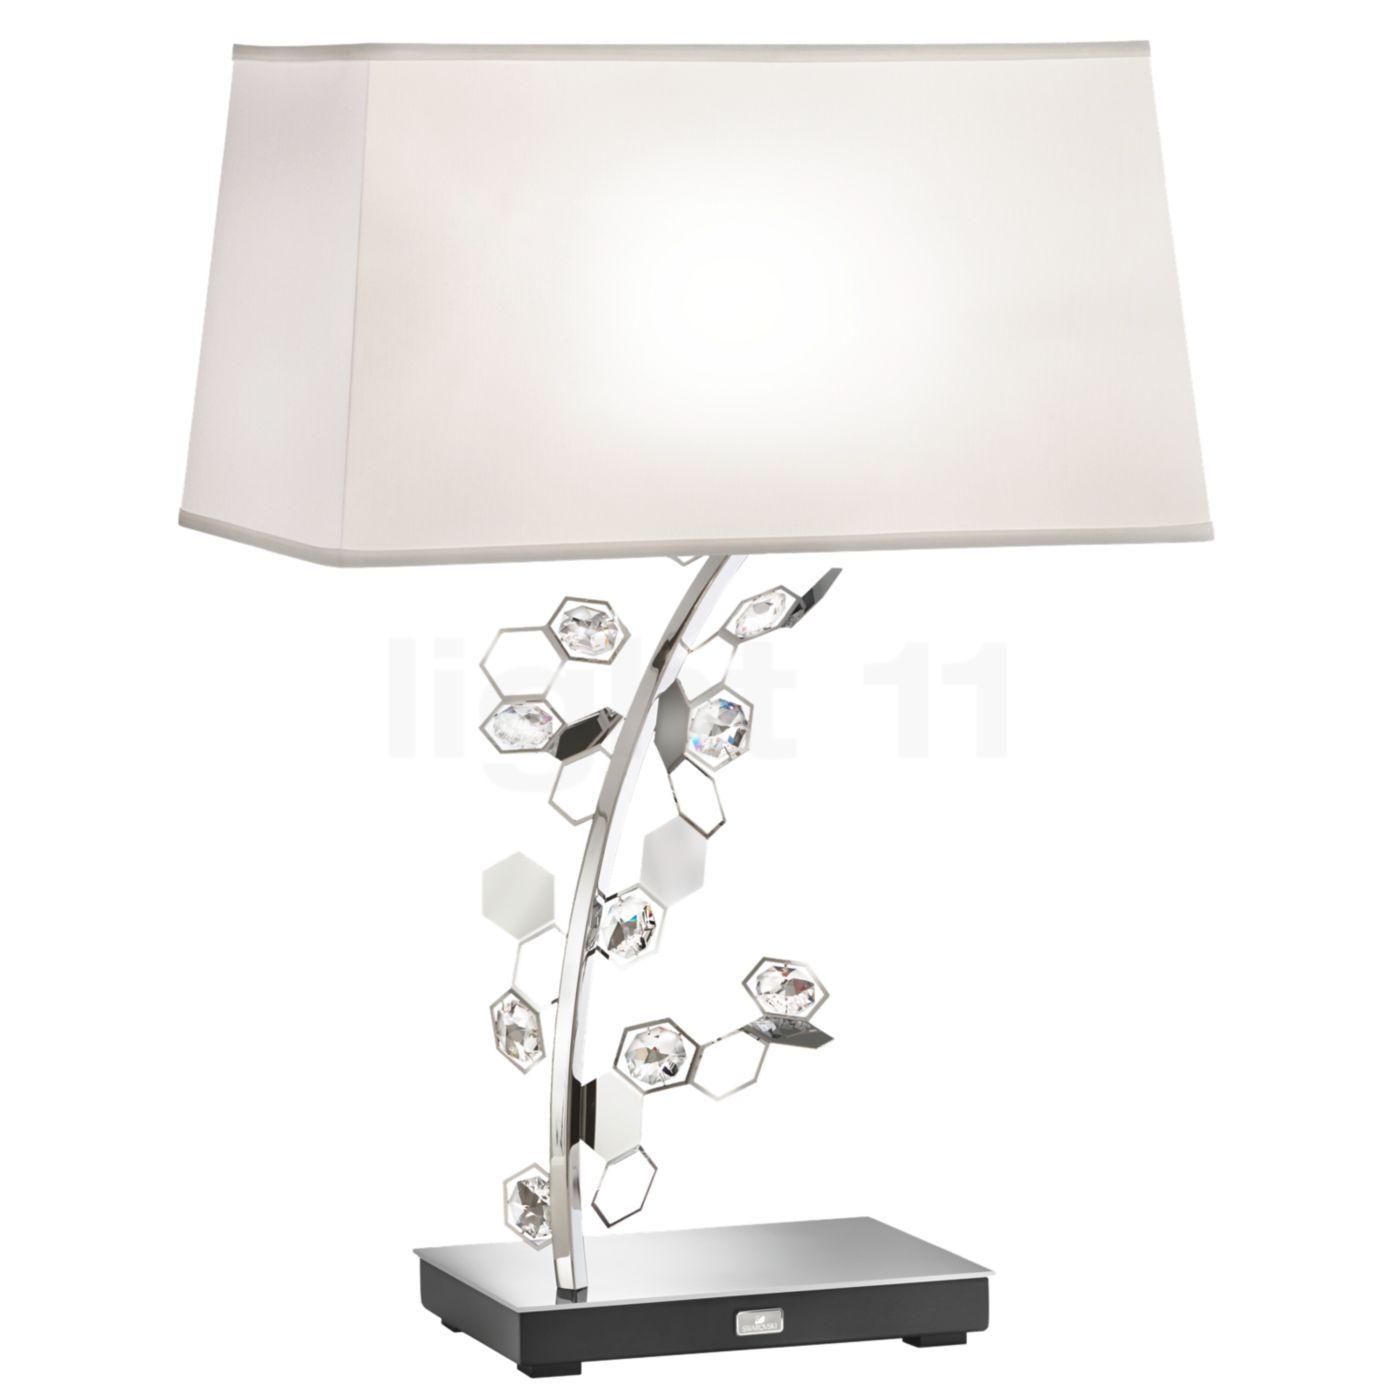 Buy swarovski crystalon table lamp at light11 aloadofball Image collections